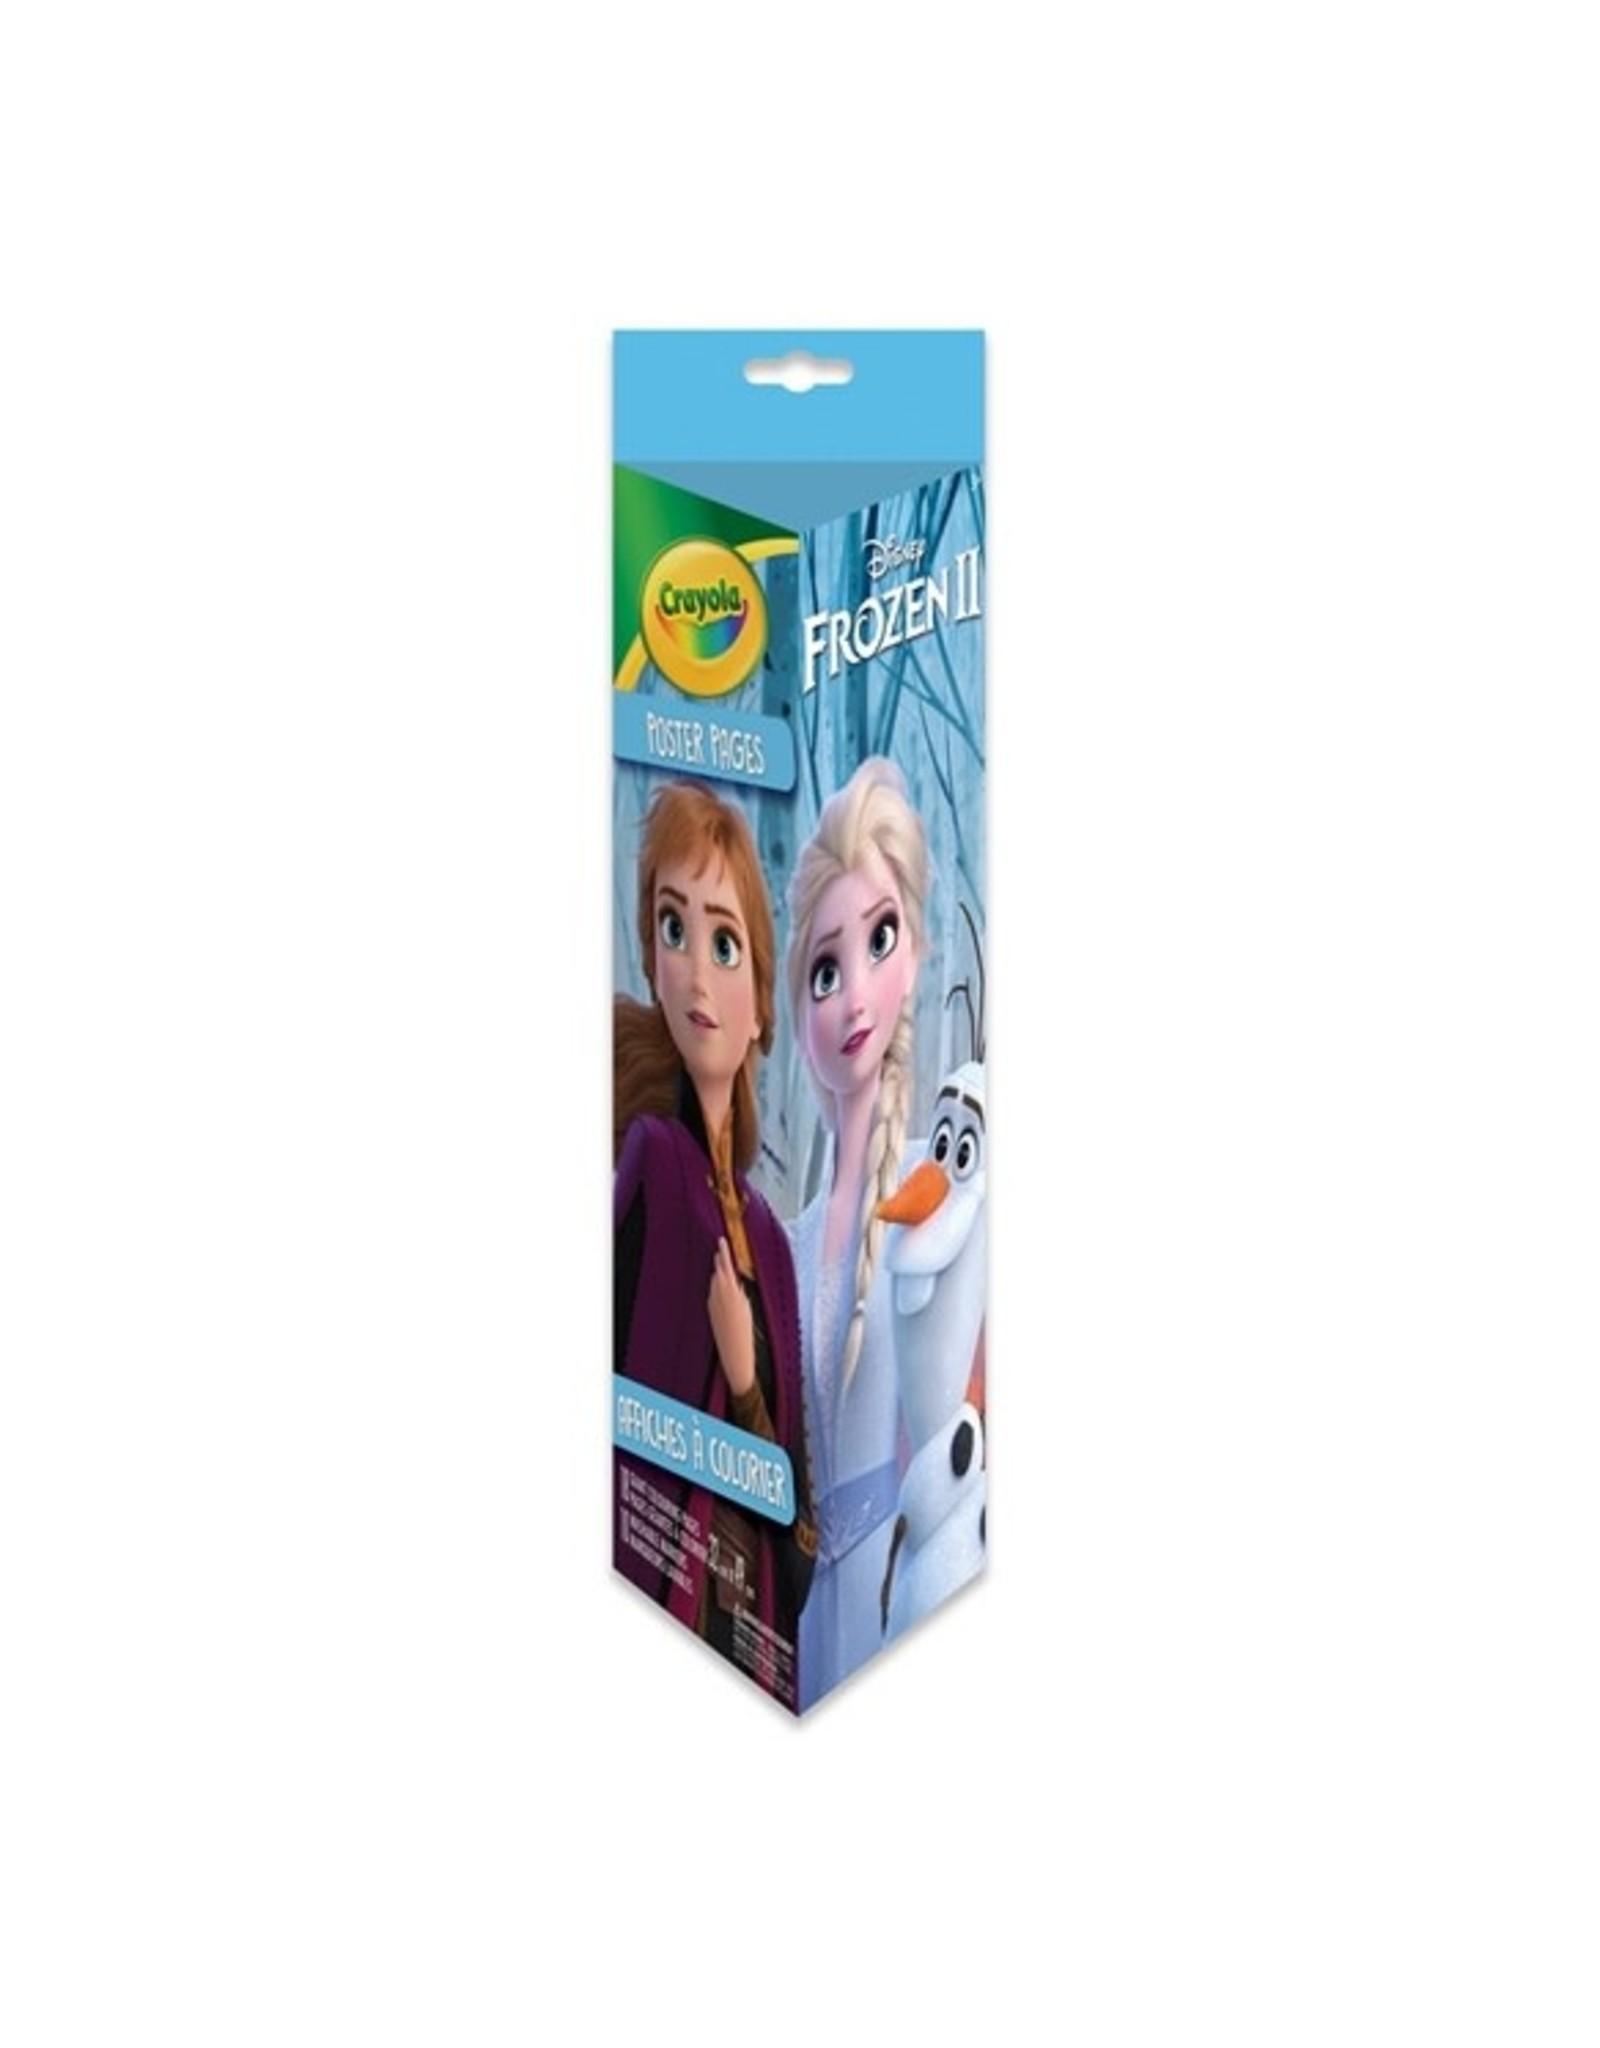 Crayola Colouring Tube - 18 pgs 10 mkr, Frozen 2